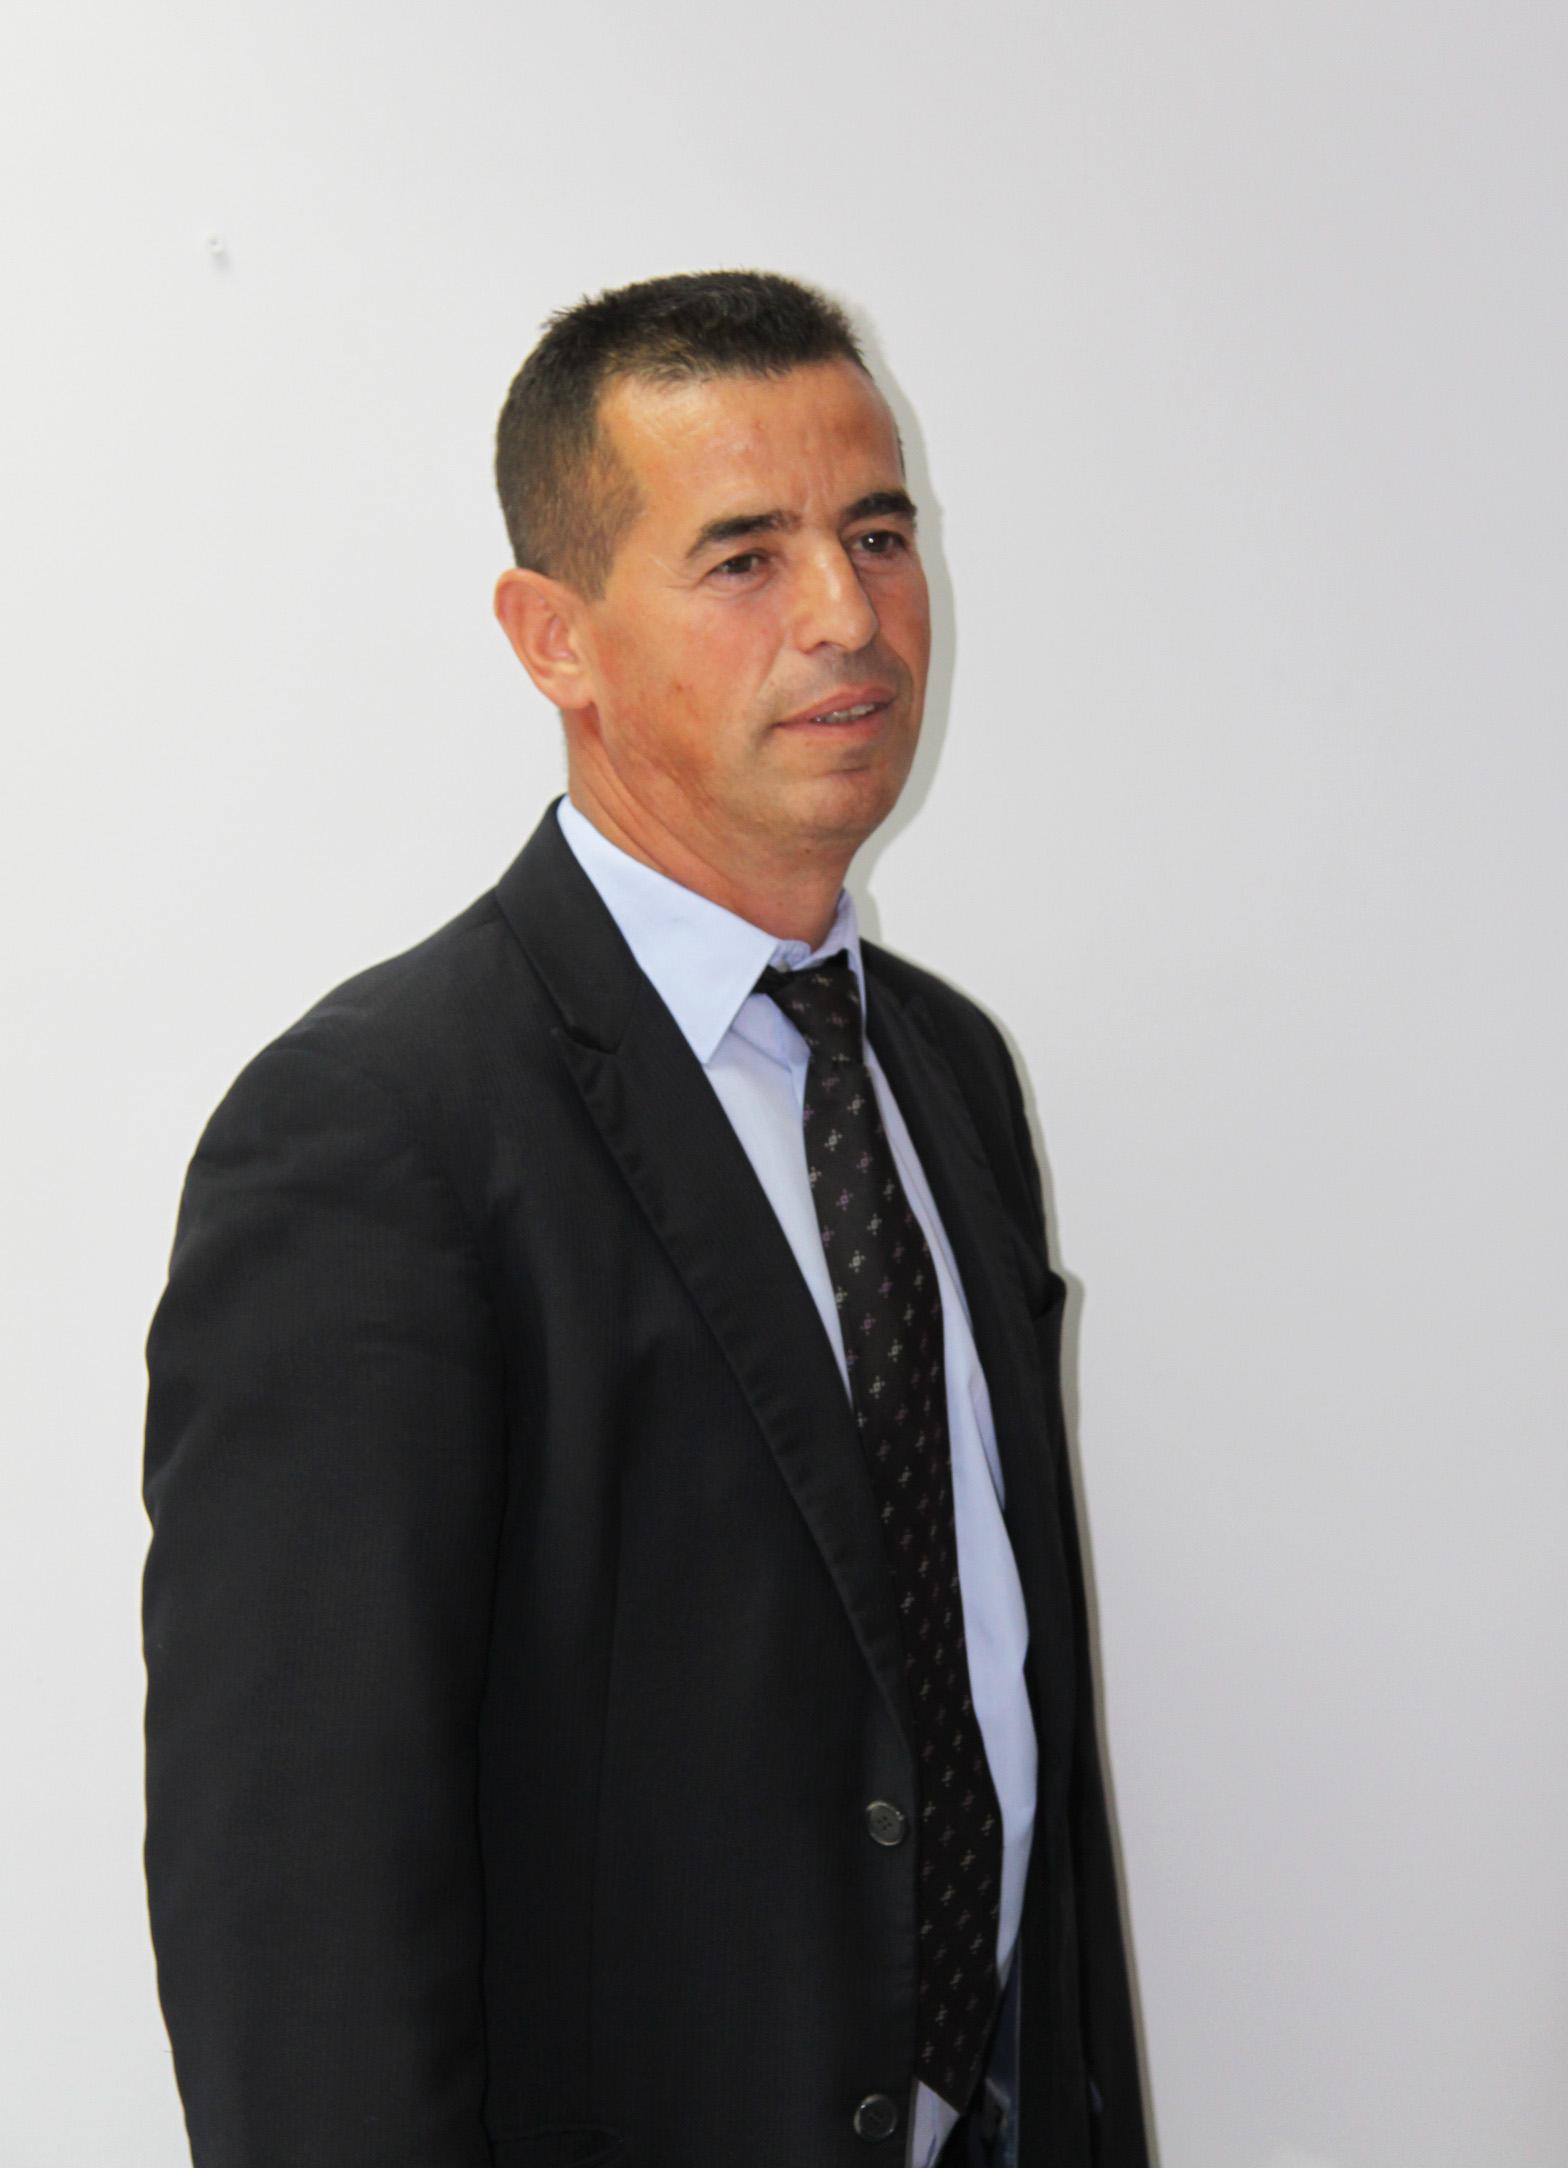 Z. Skender Hysen Selmani